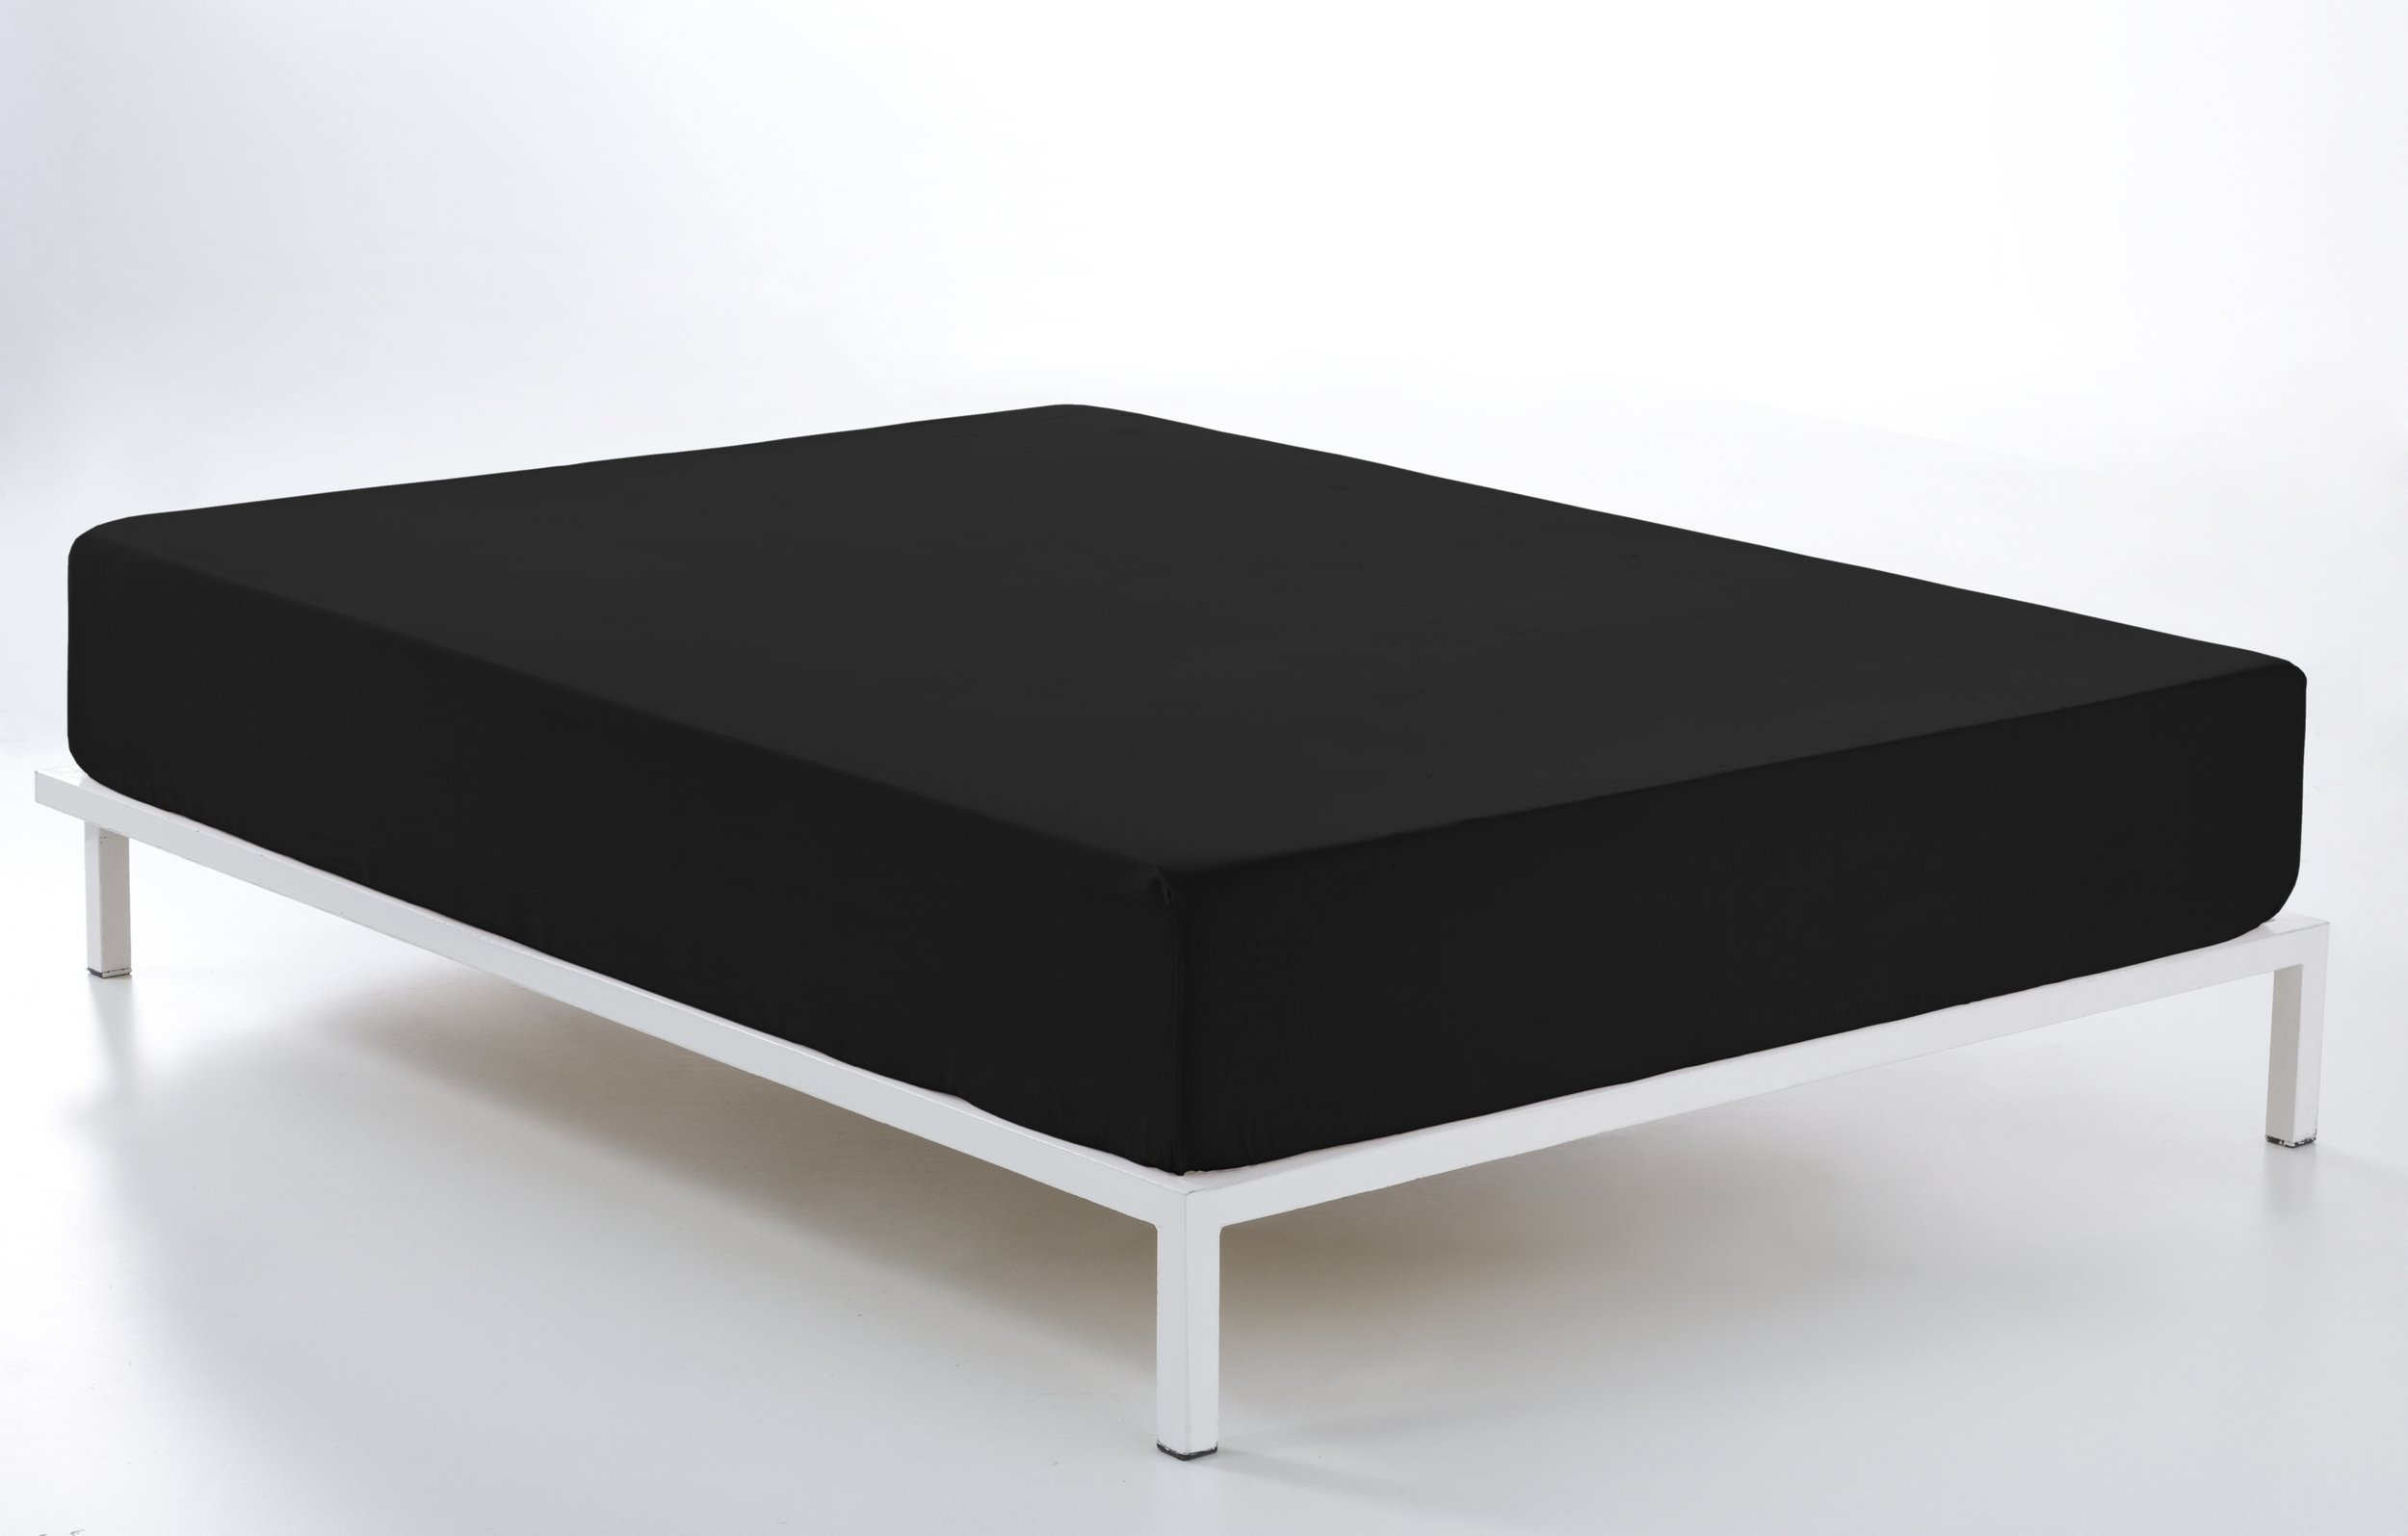 ESTELA - Sábana Bajera Ajustable Combi Color Negro - Cama de 90 cm. - 50% Algodón / 50% Poliéster - 144 Hilos: Amazon.es: Hogar